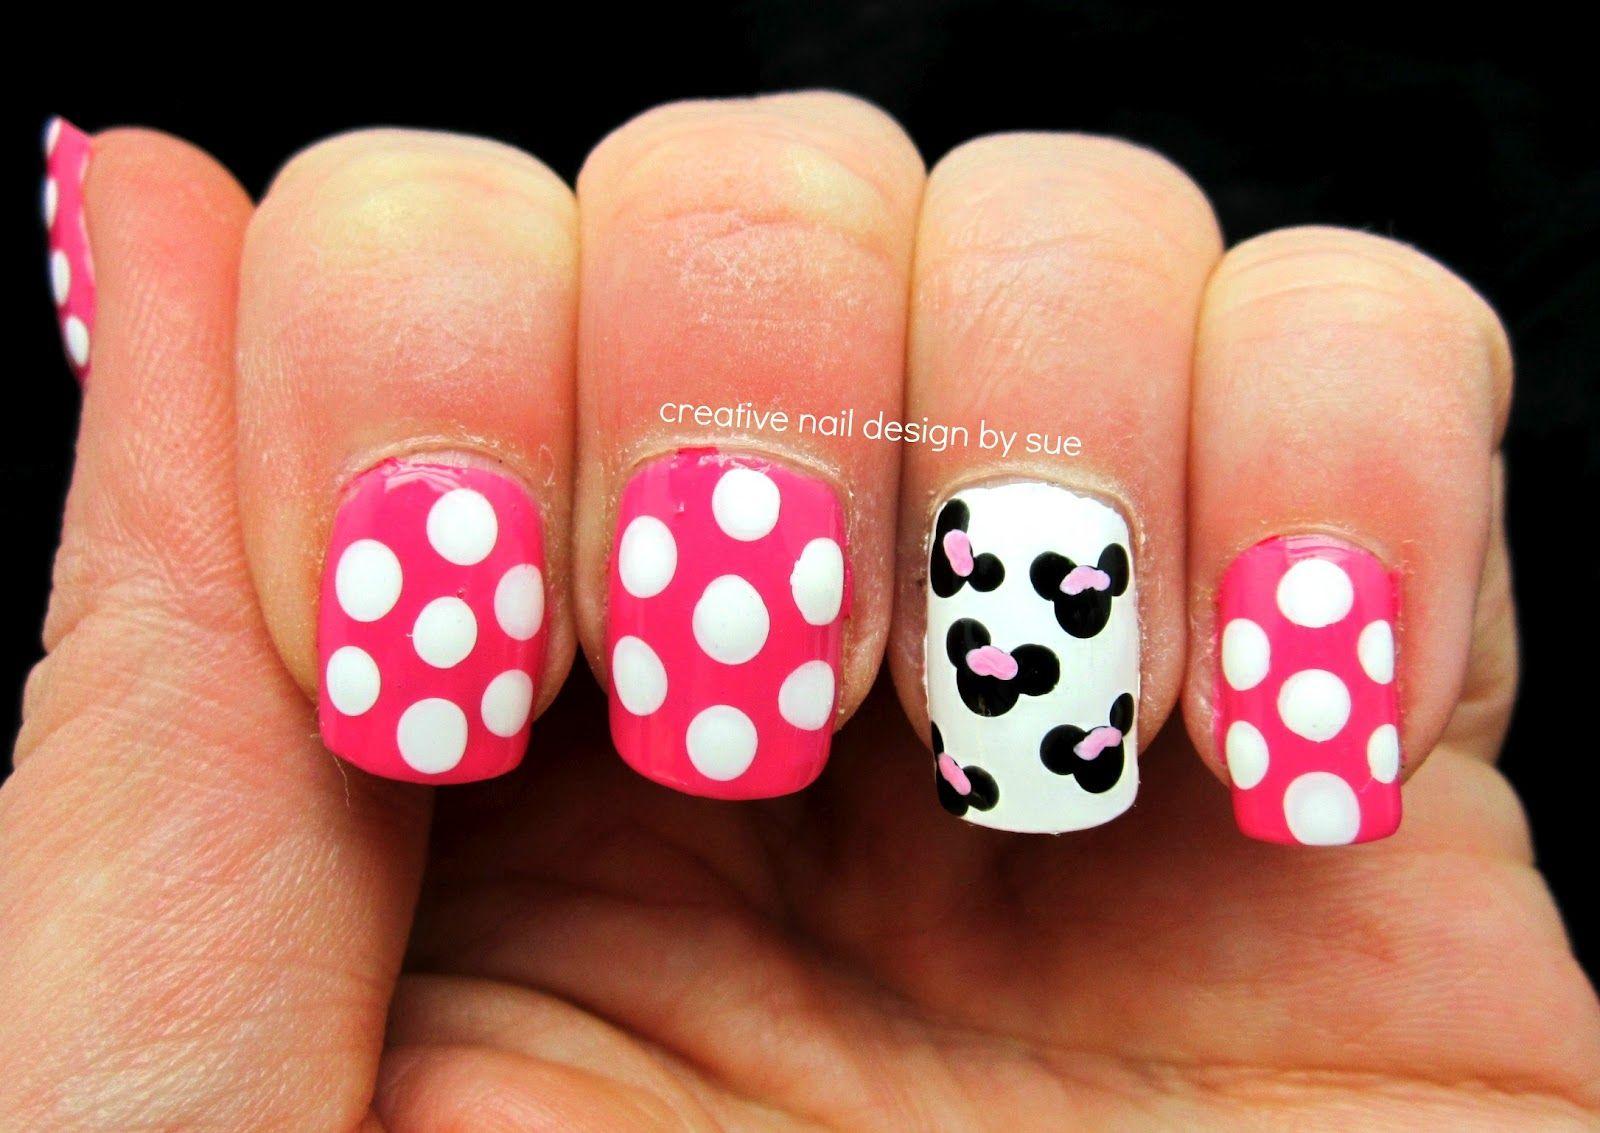 mimi+mouse+nail   Creative Nail Design by Sue: Matching nails & tops ...